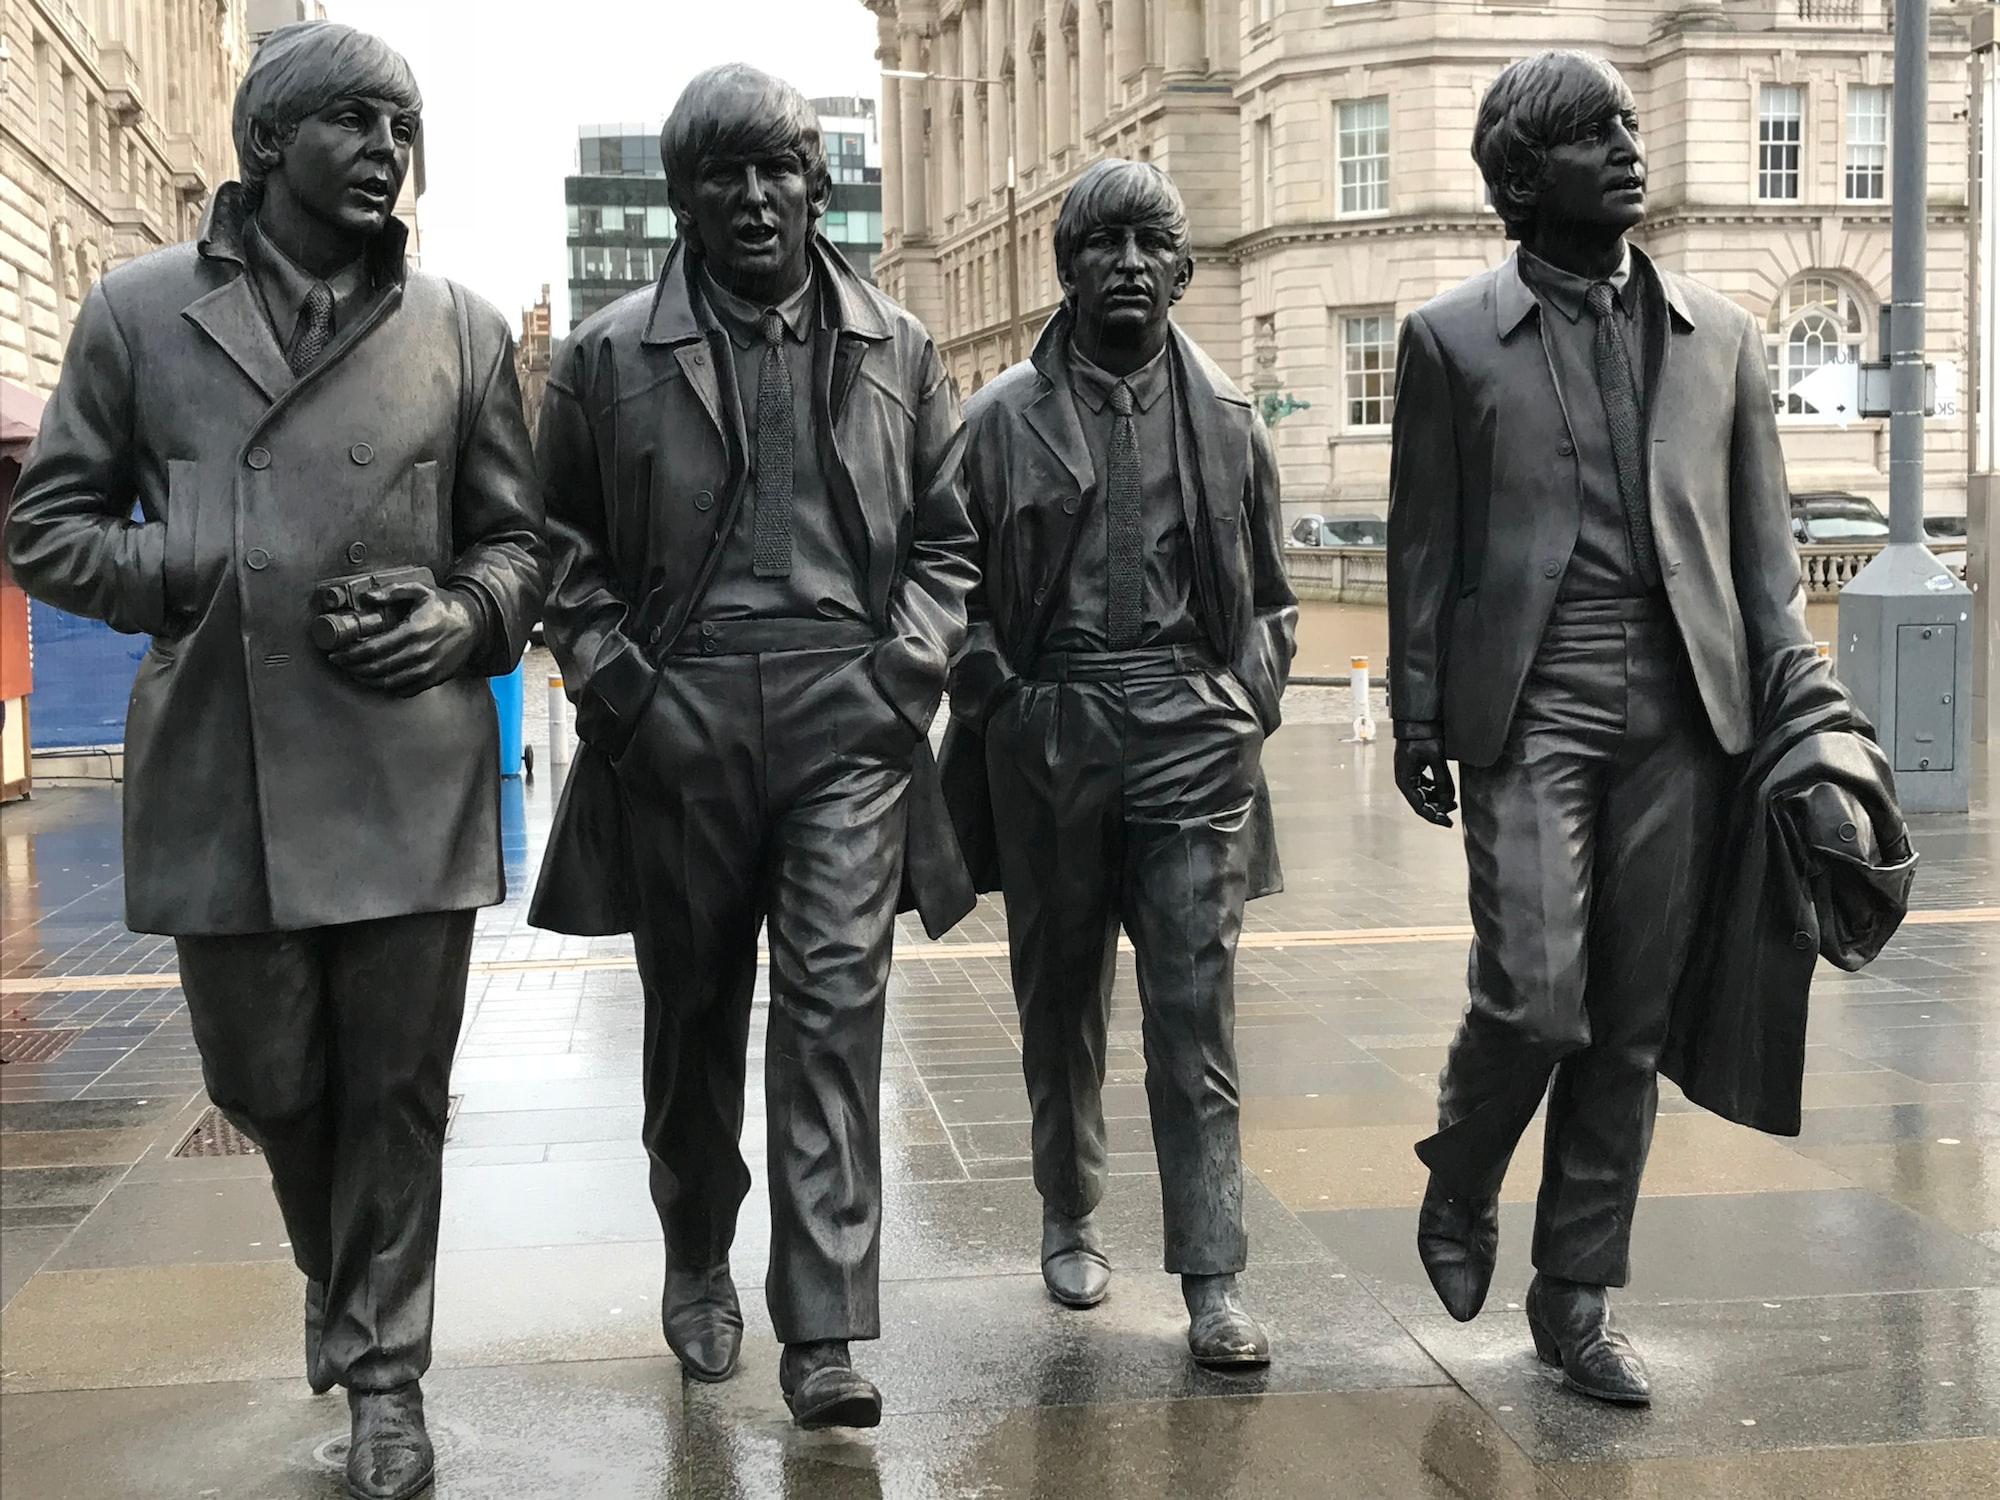 * Bytown Ukulele Group (BUG) Beatles' Songbook